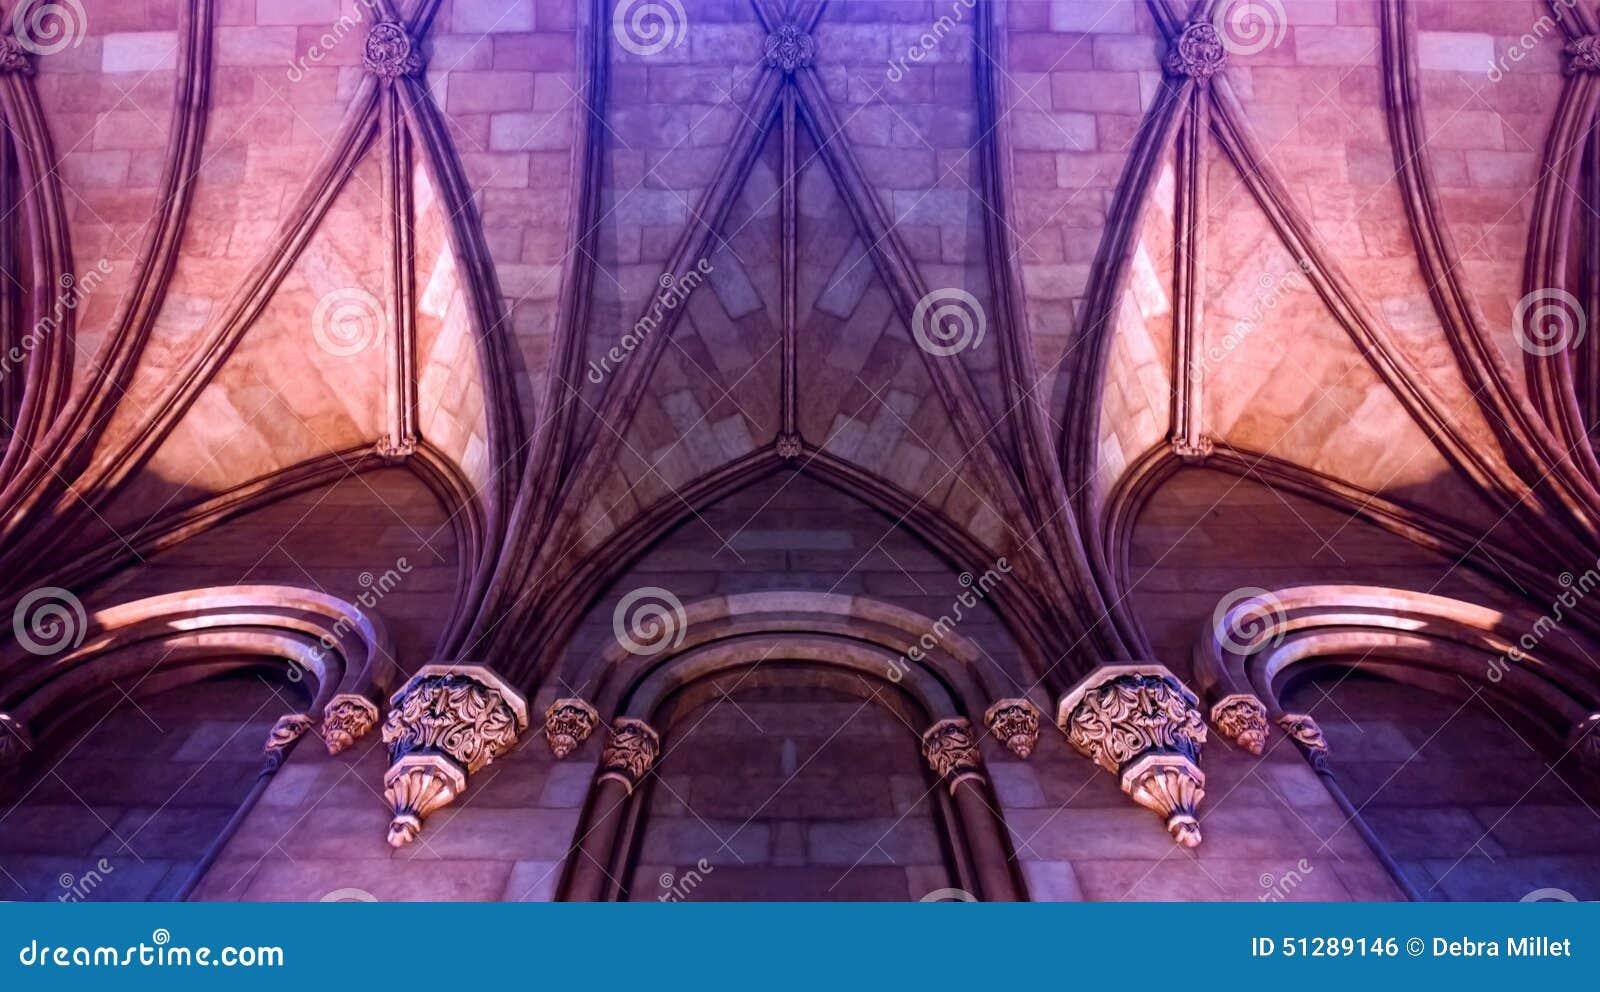 romanesque castle stock photo - image: 51289146